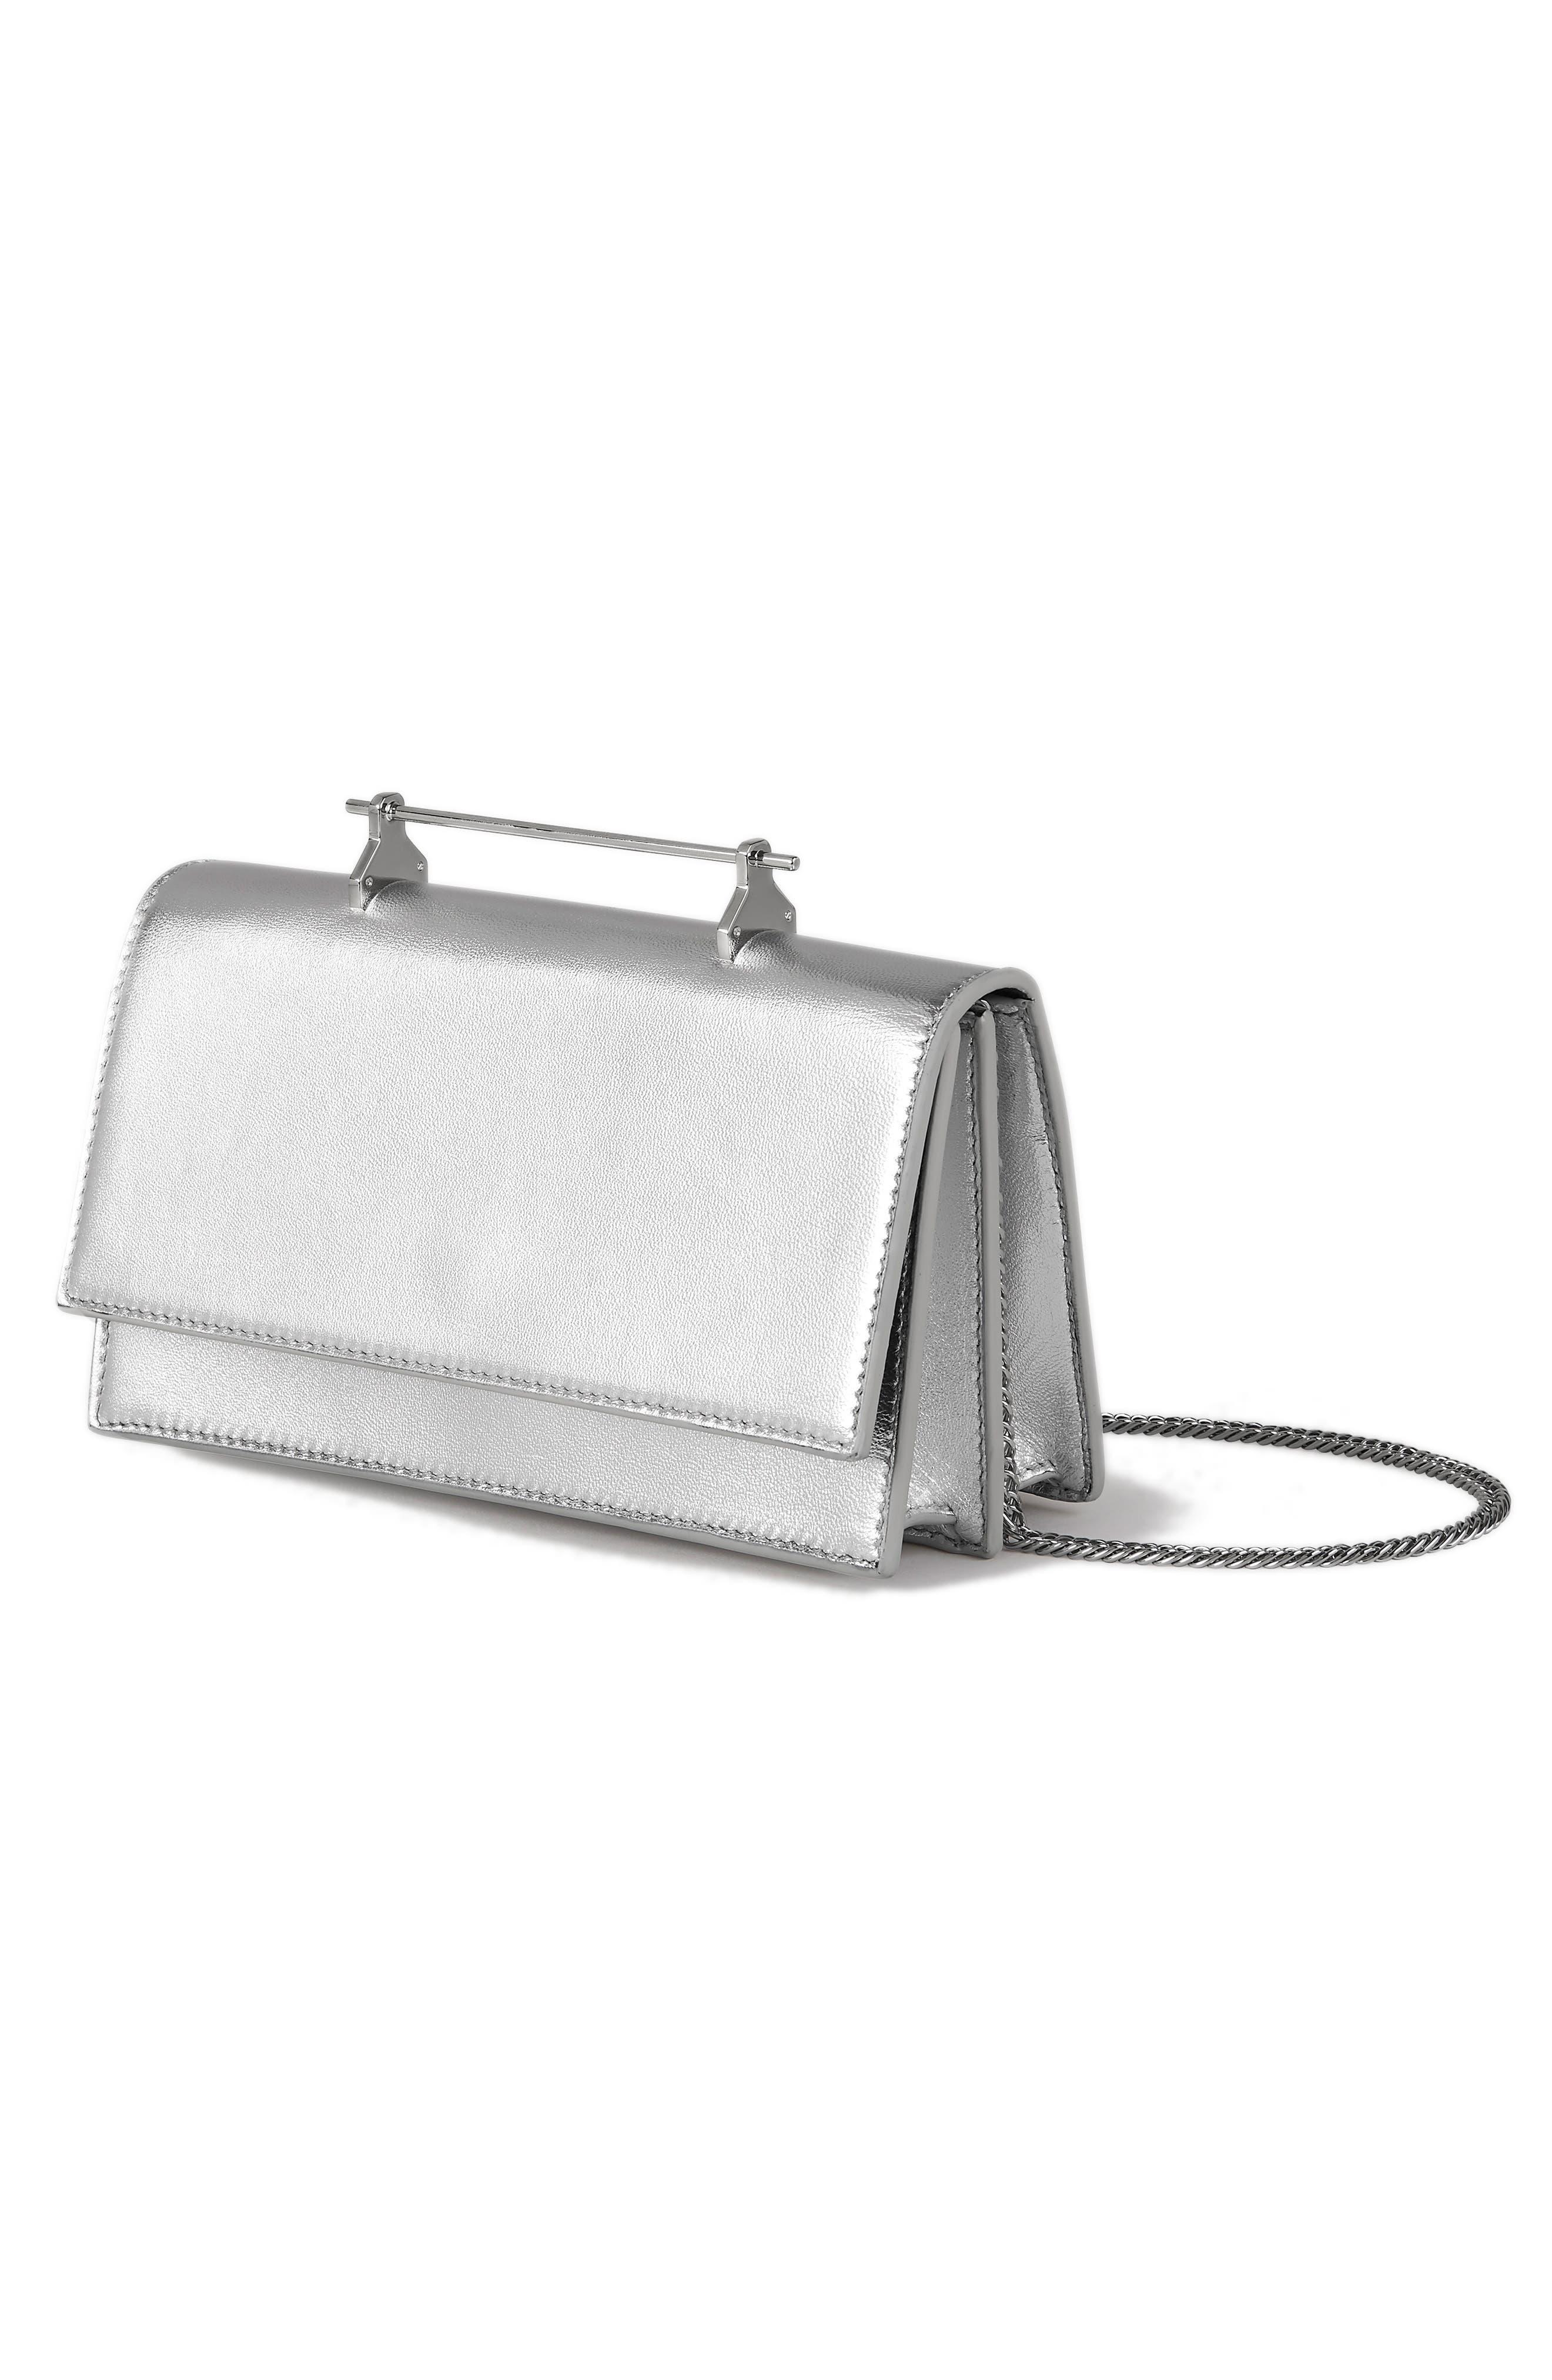 Alexia Metallic Leather Shoulder Bag,                             Alternate thumbnail 3, color,                             Metallic Silver/ Silver